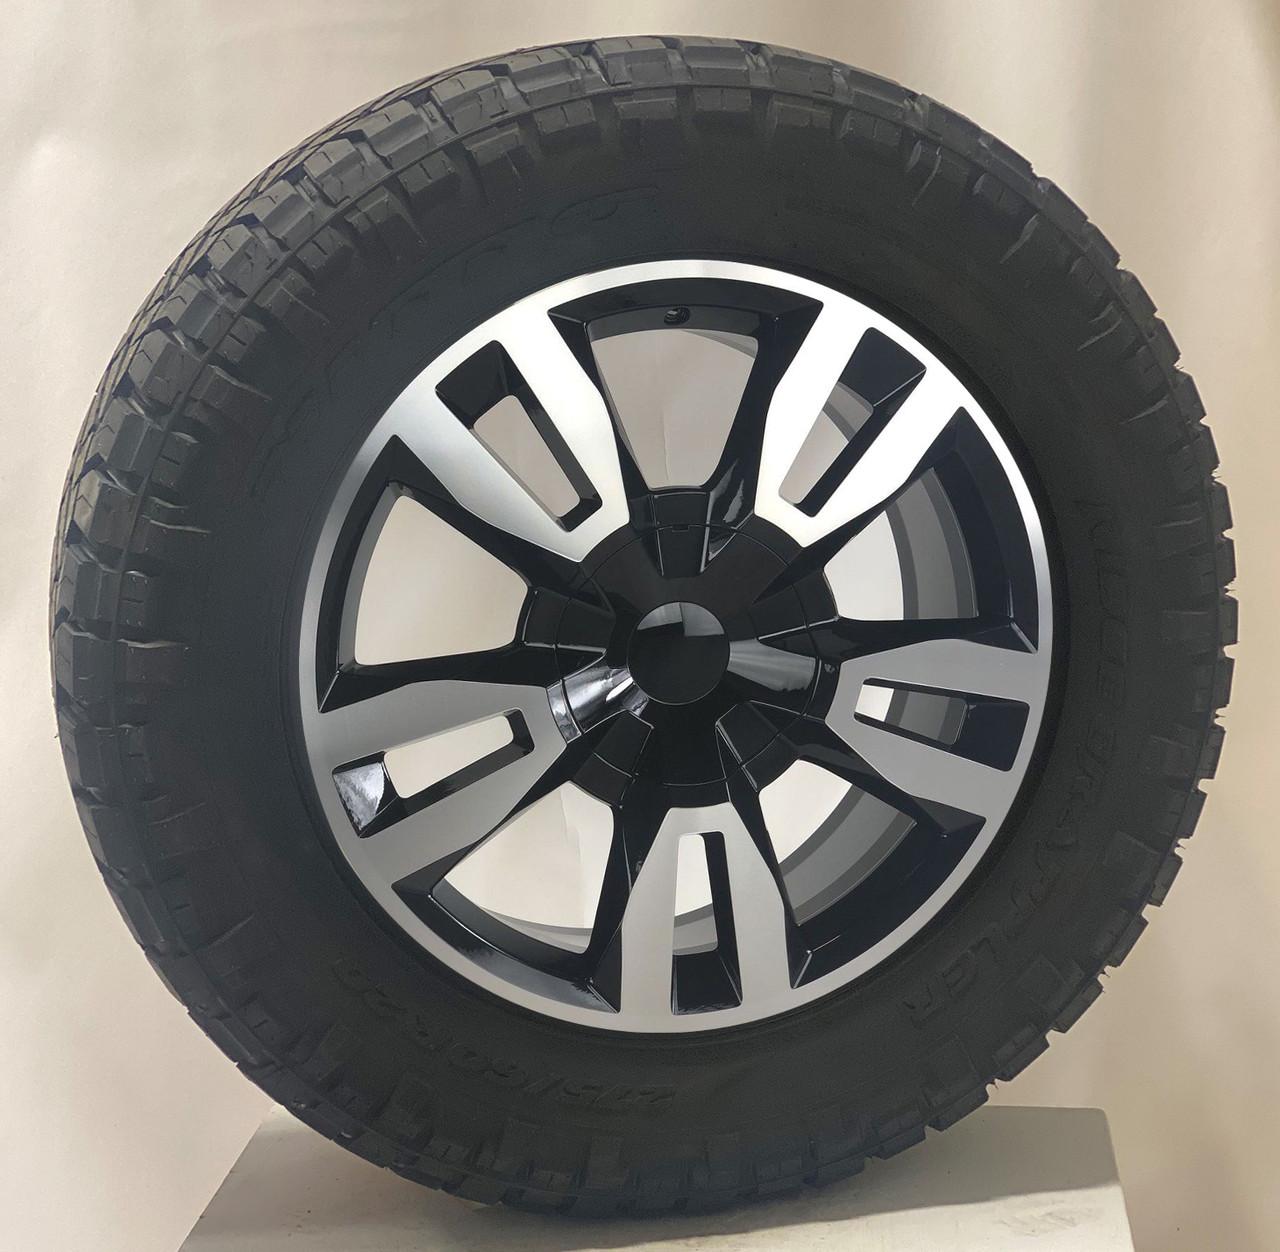 "Black and Machine 20"" RST Style Split Spoke Wheels with Nitto Ridge Grappler Tires for GMC Sierra, Yukon, Denali - New Set of 4"